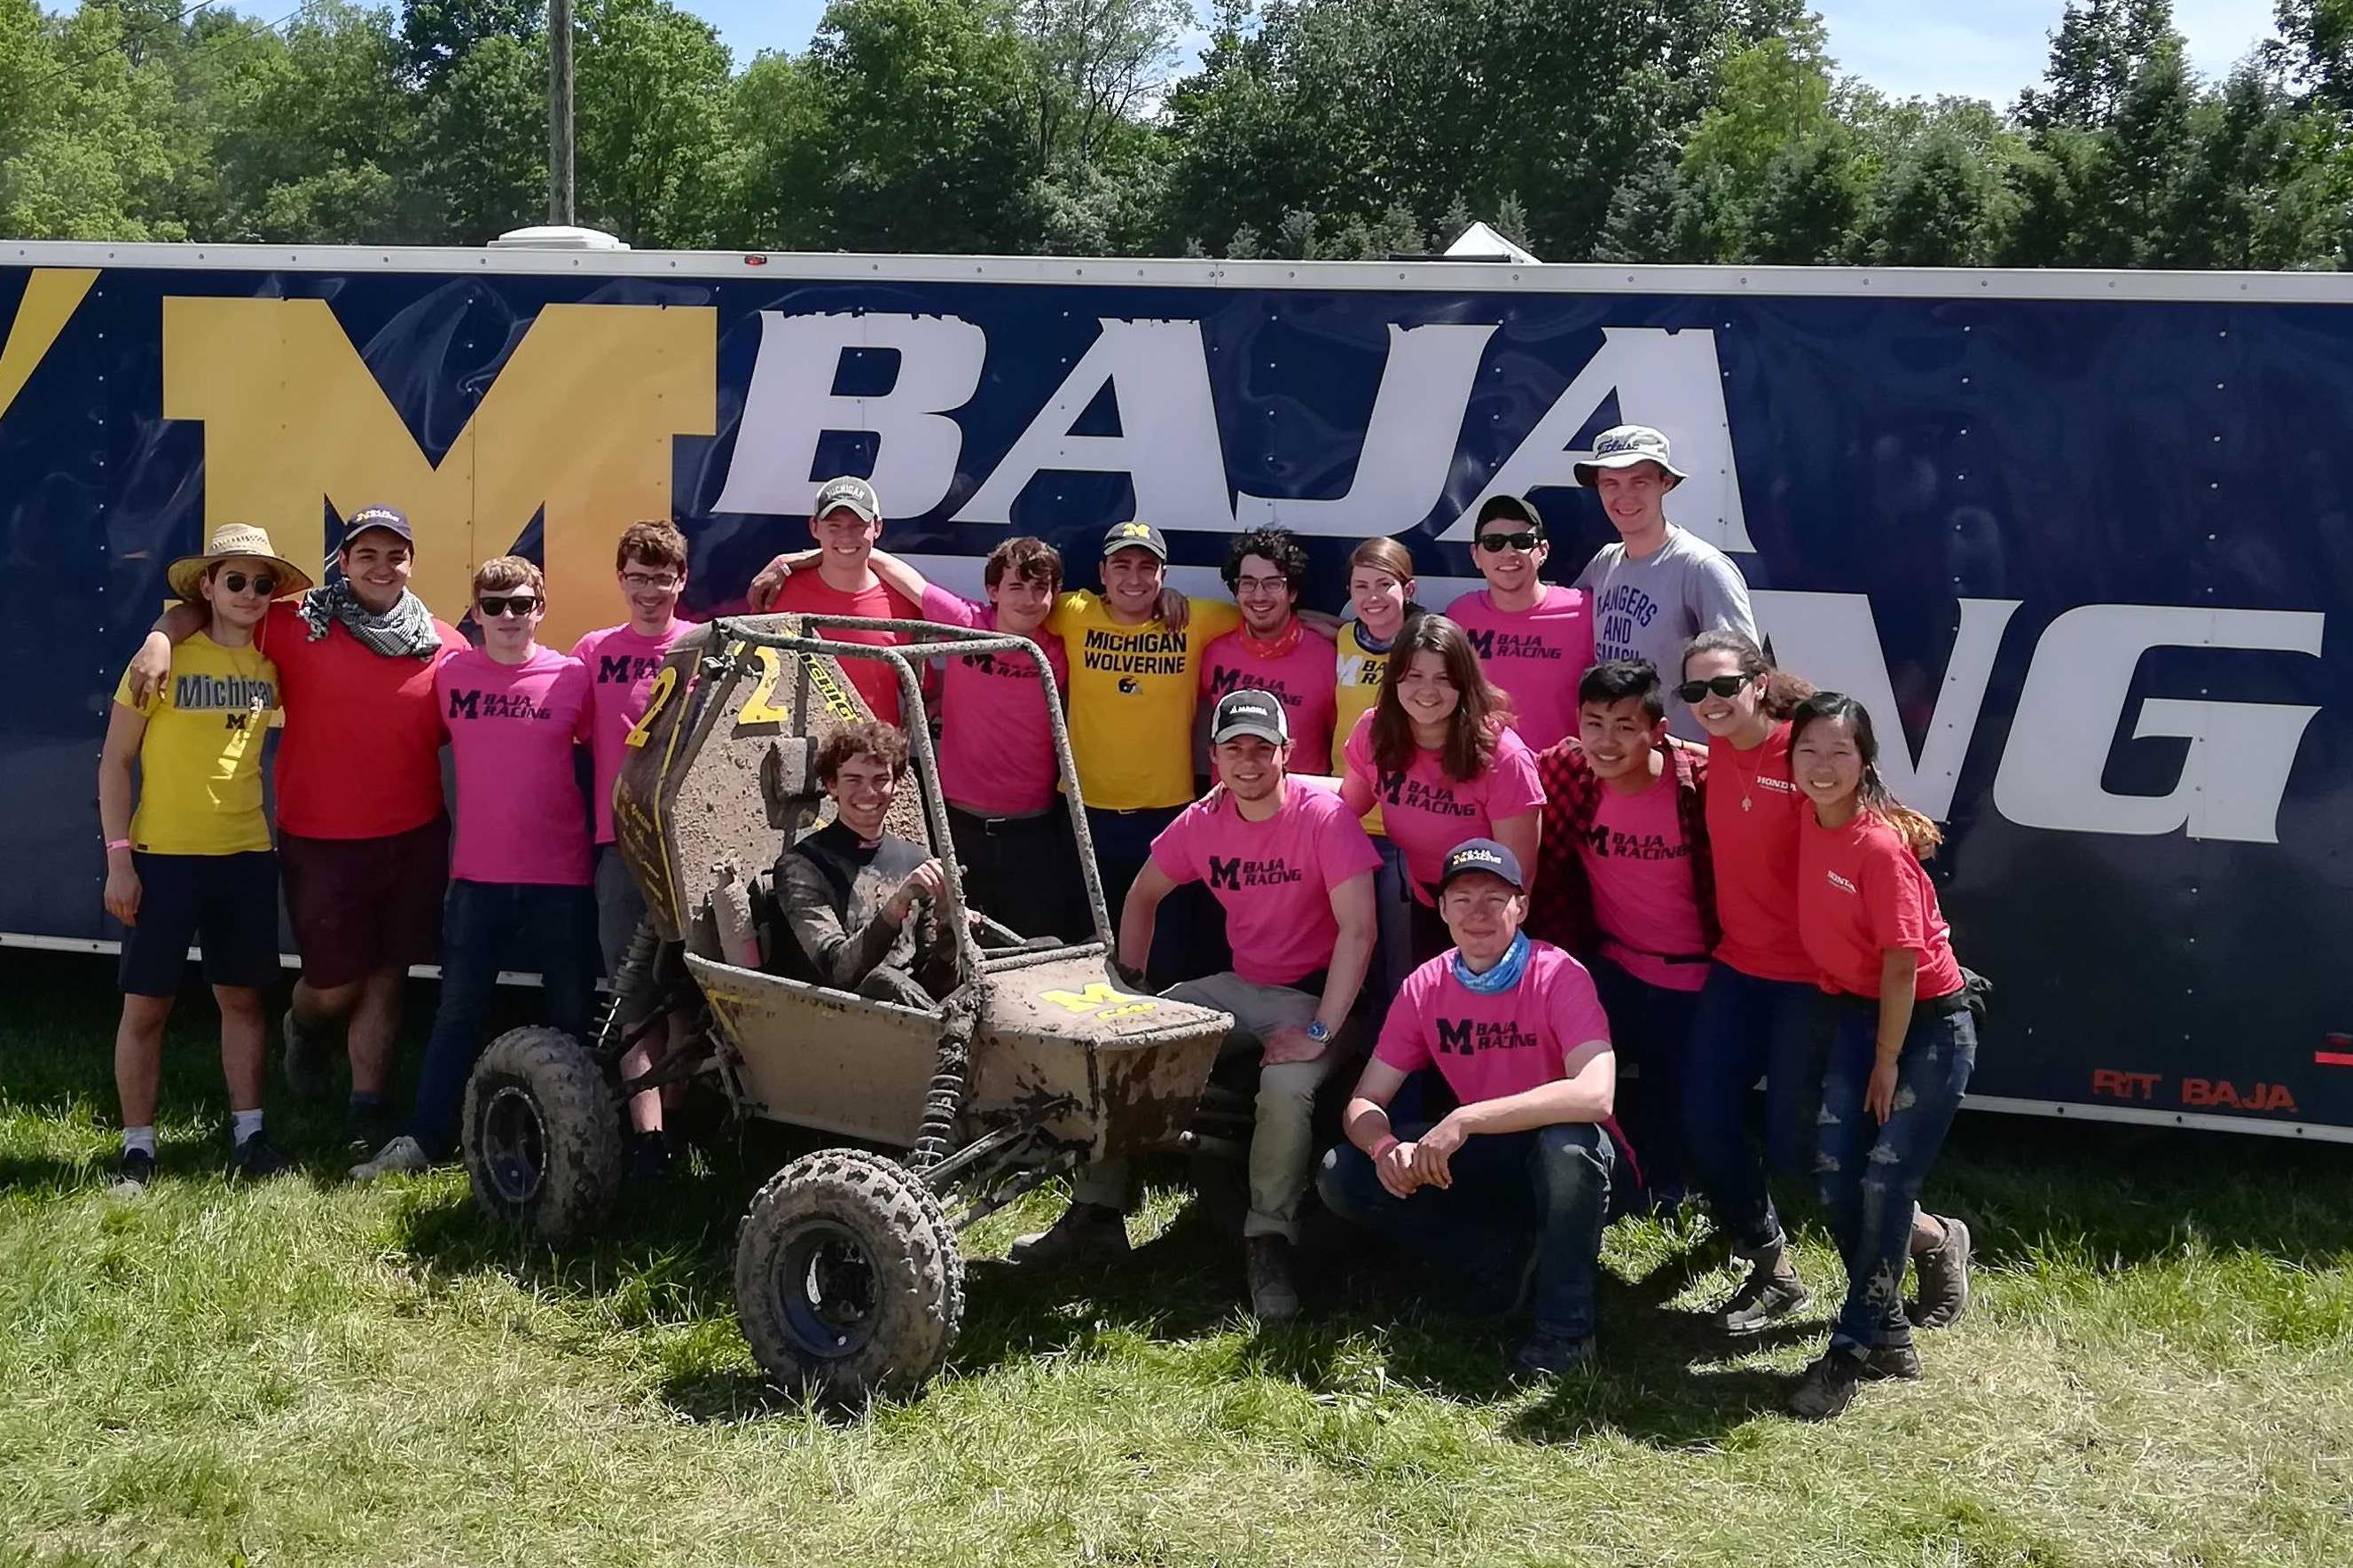 Michigan Baja Racing Team and Car